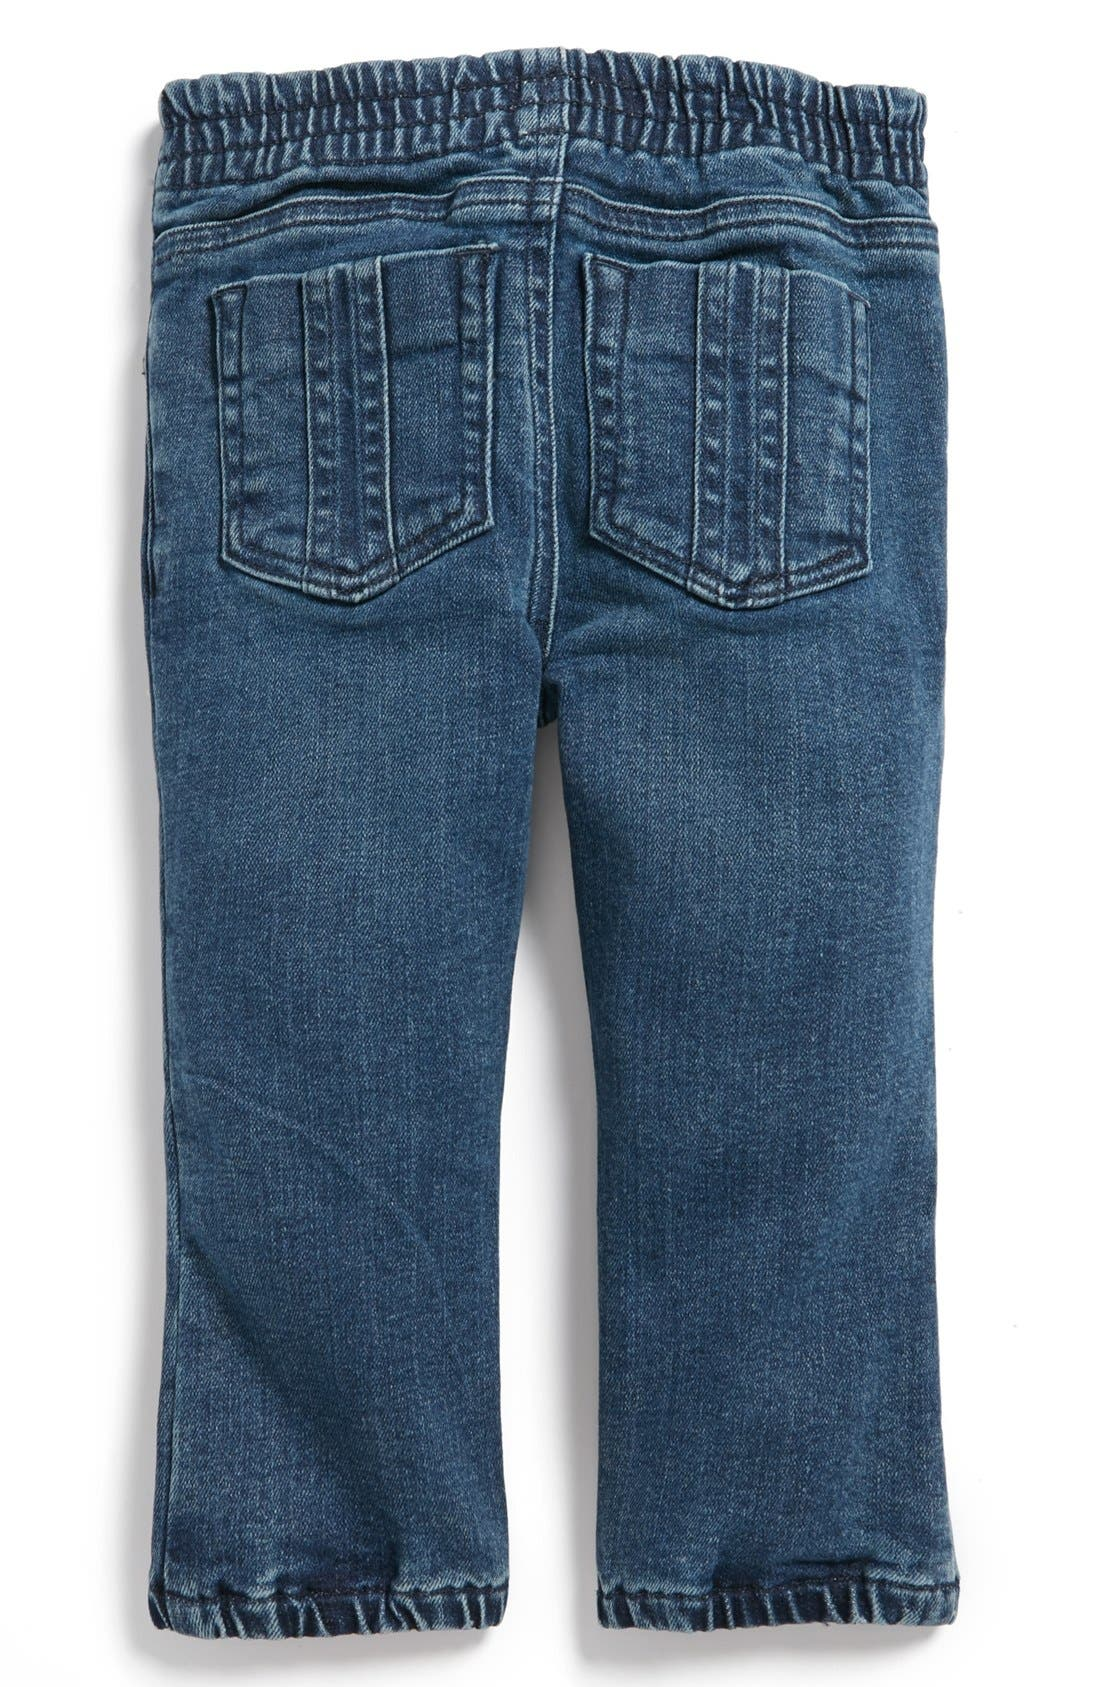 Alternate Image 1 Selected - Burberry Denim Pants (Toddler Girls)